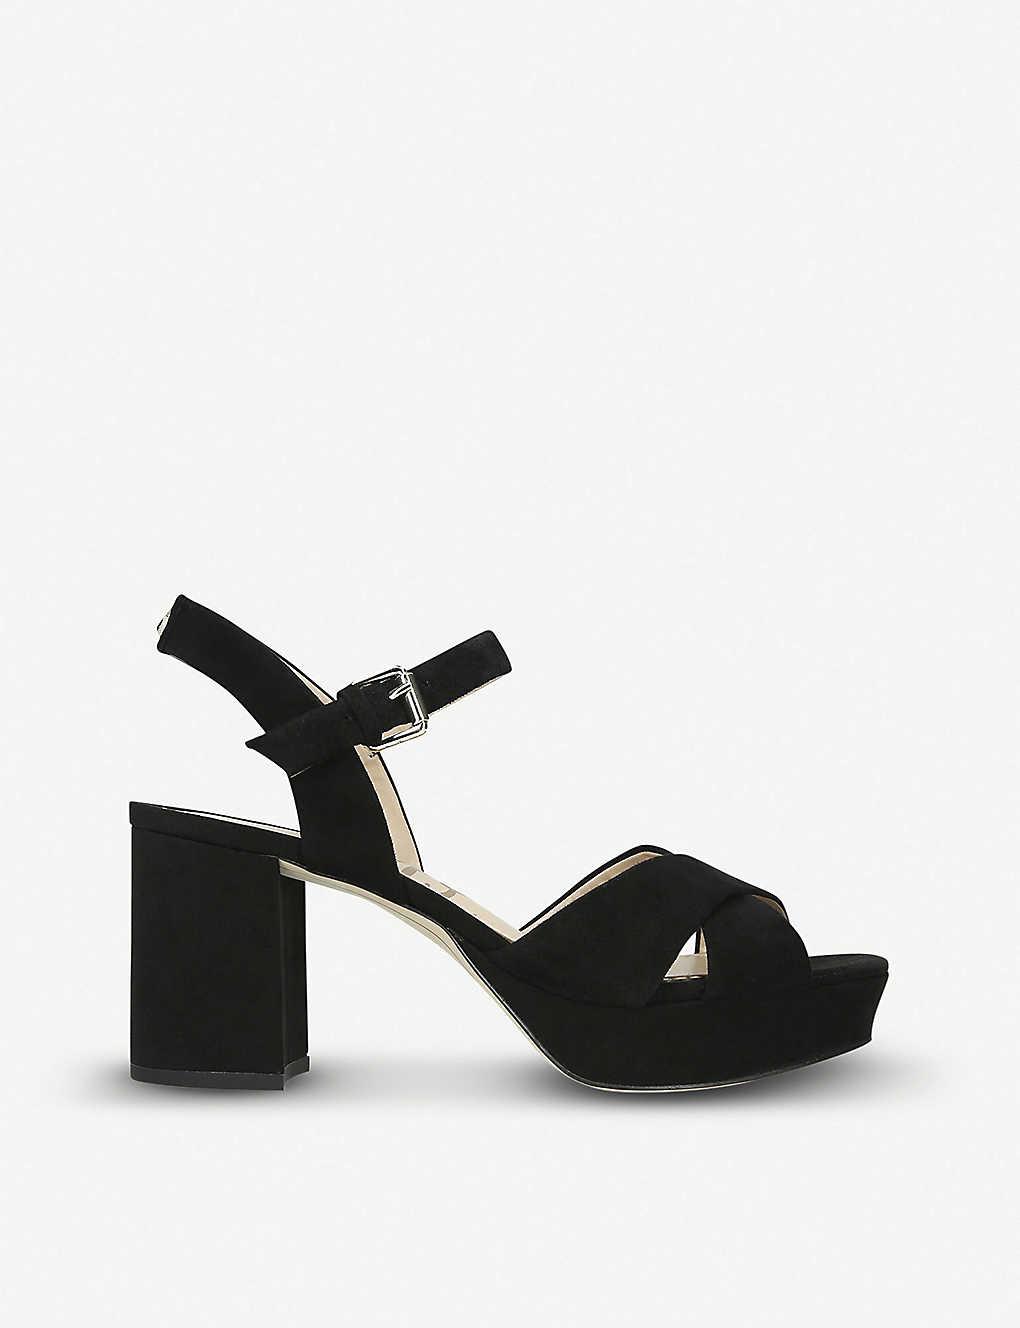 551e540a4fd6 SAM EDELMAN - Jolene suede platform sandals